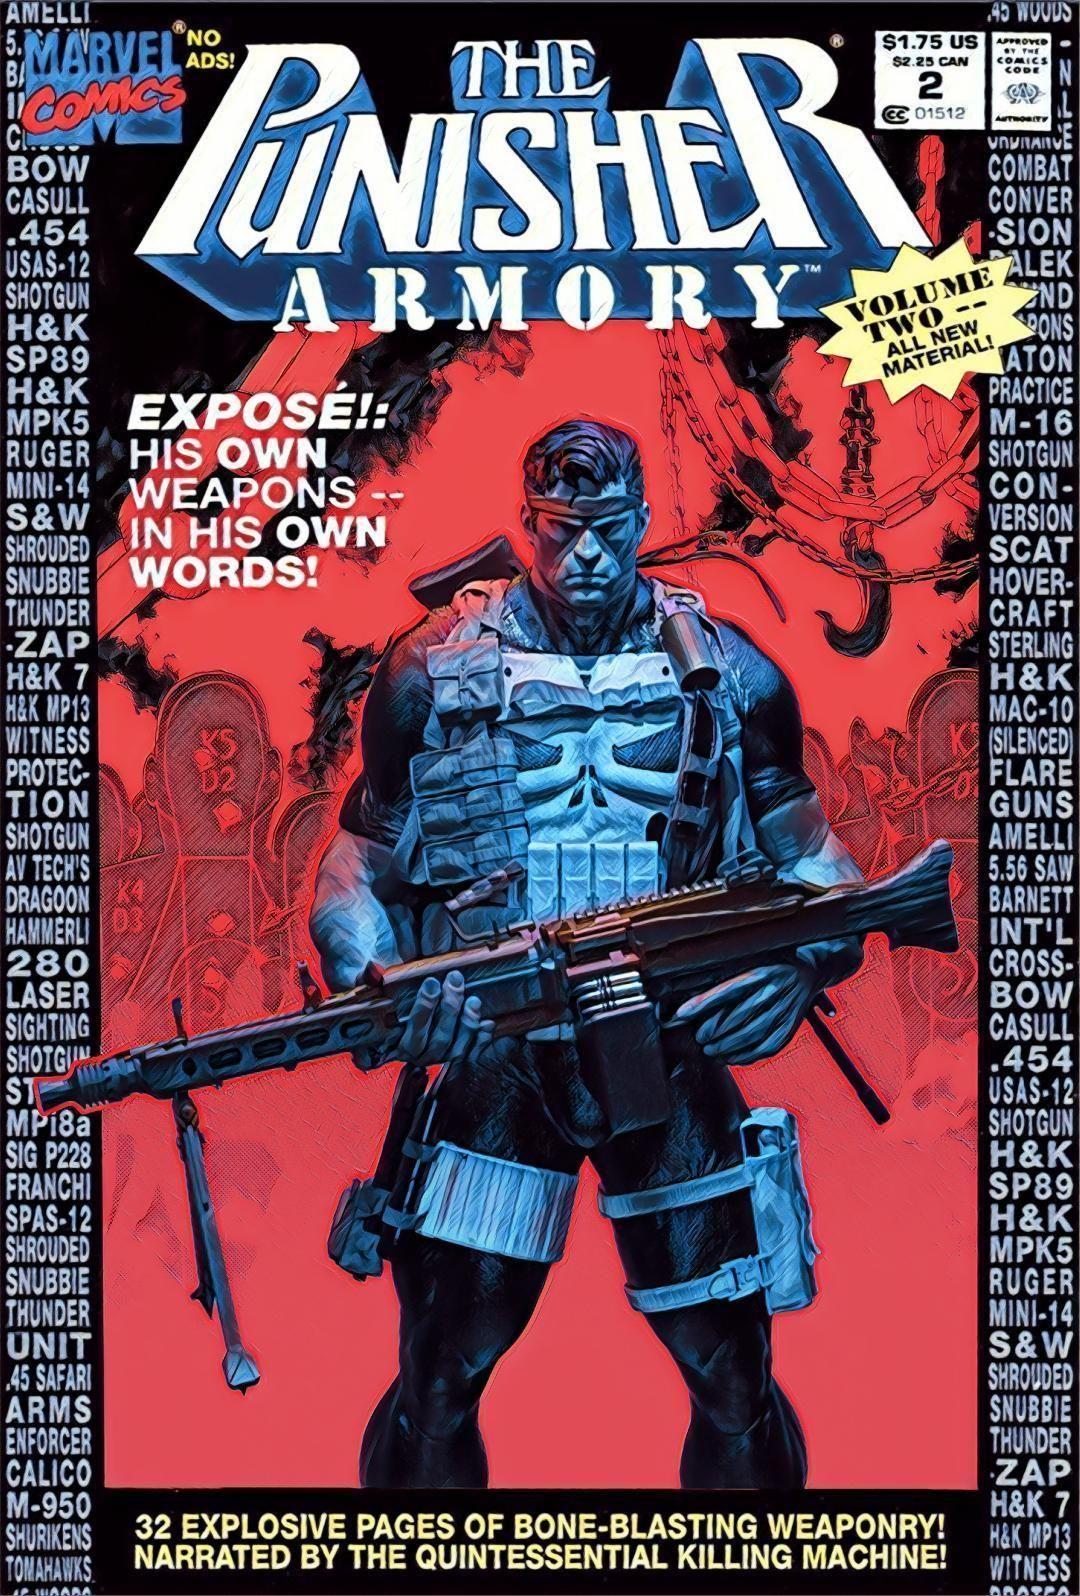 The Punisher Armory Fan Art Statue